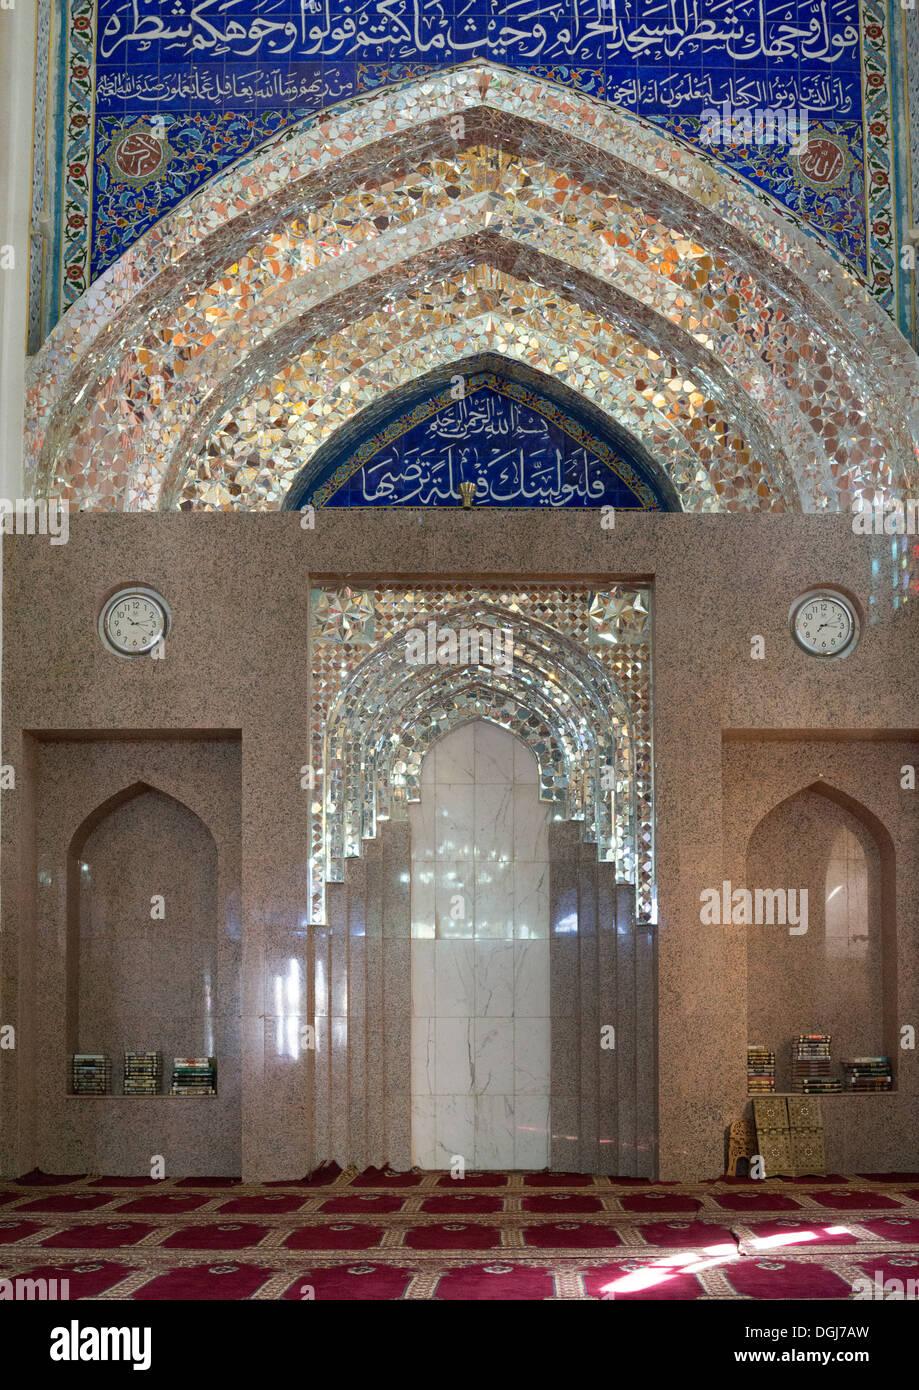 Jalil Khayat Mosque, Erbil, Kurdistan, Iraq - Stock Image